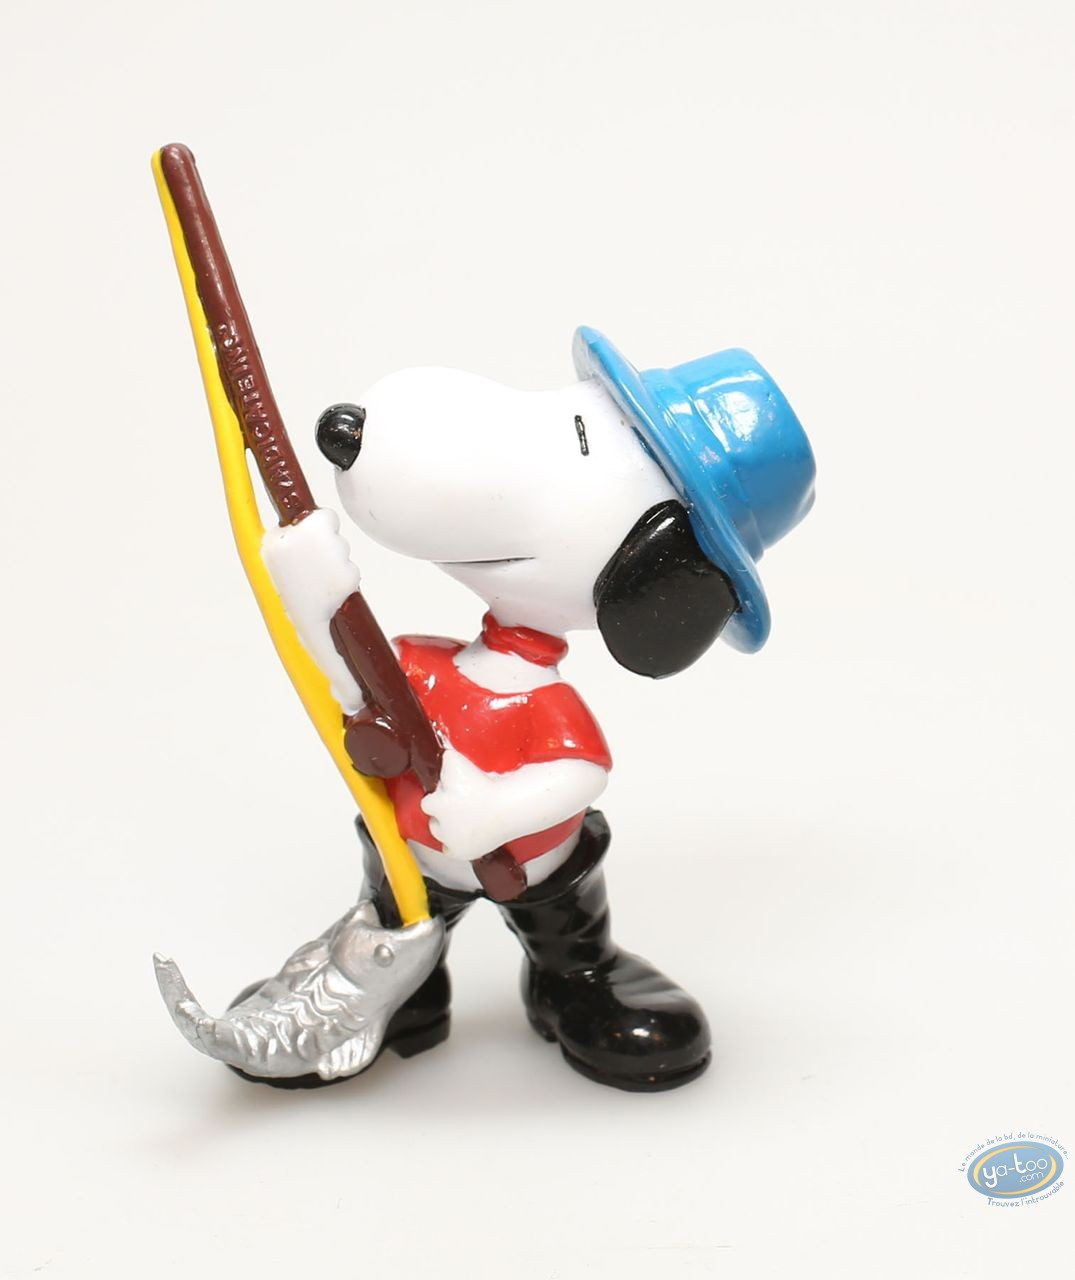 Plastic Figurine, Snoopy : Snoopy fischerman